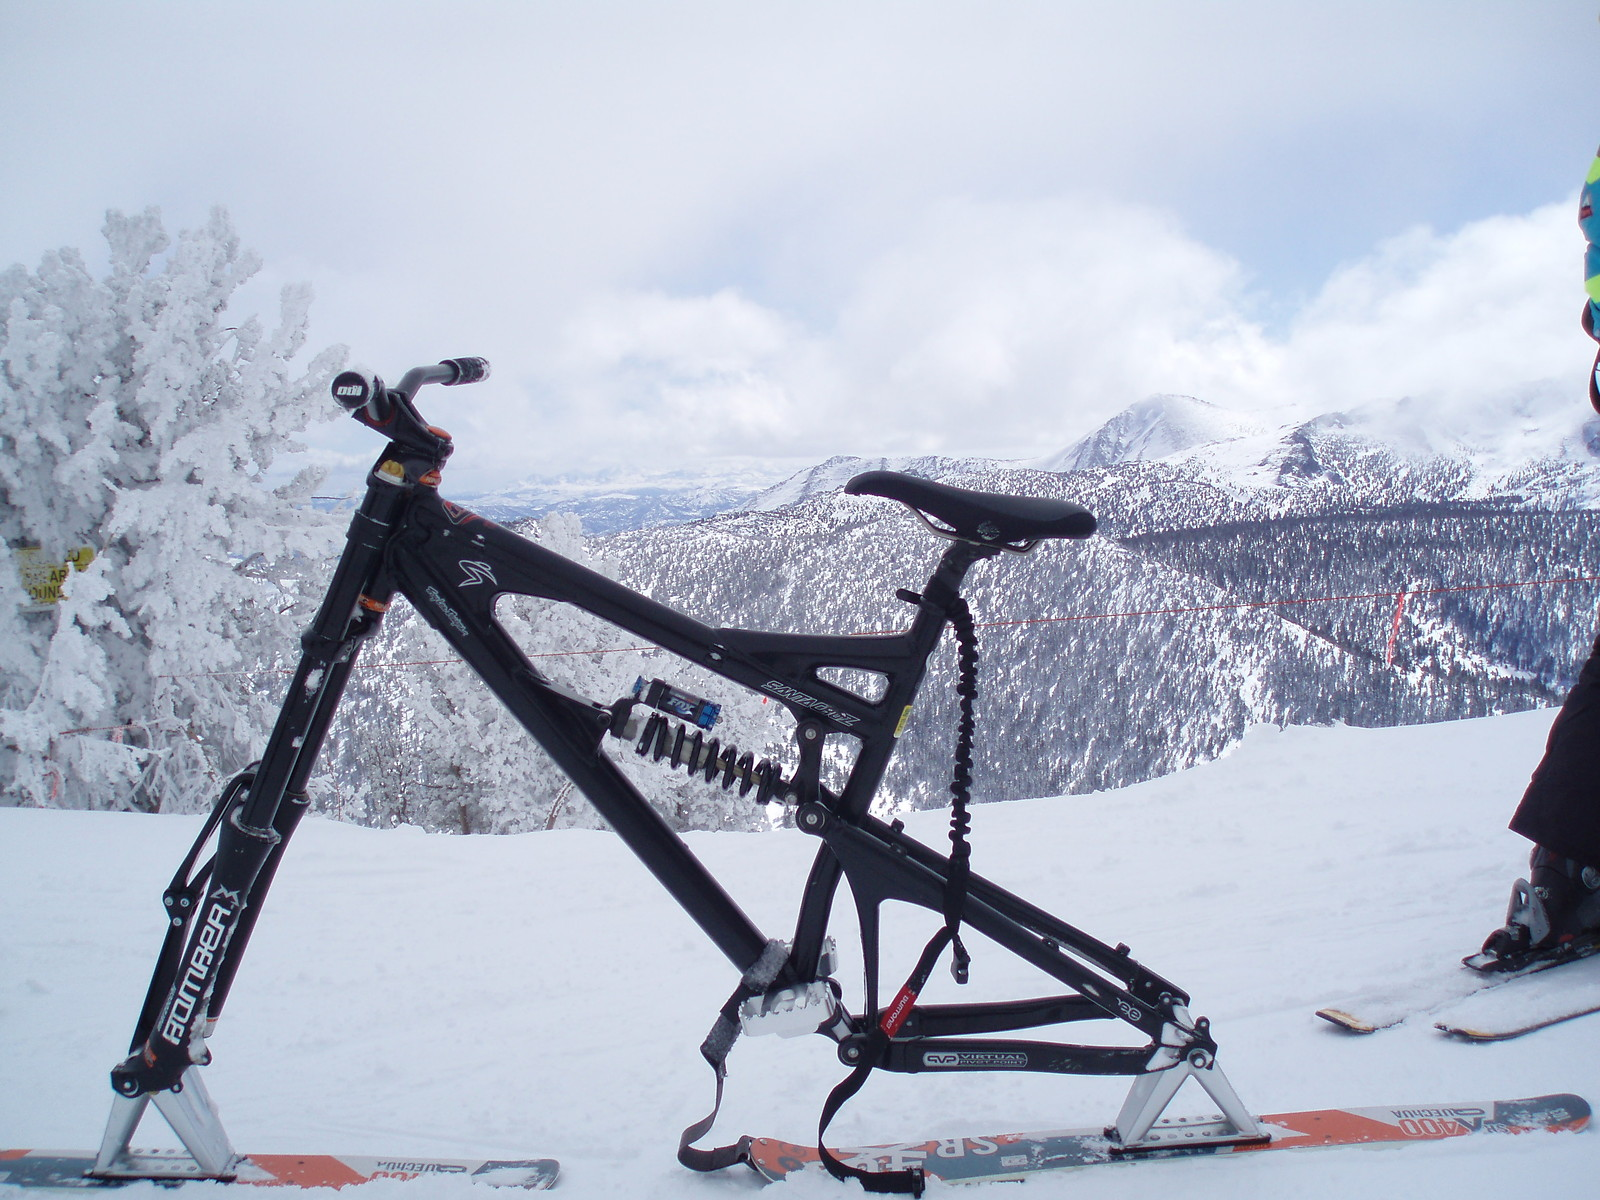 P3020020 - trailmarc - Mountain Biking Pictures - Vital MTB